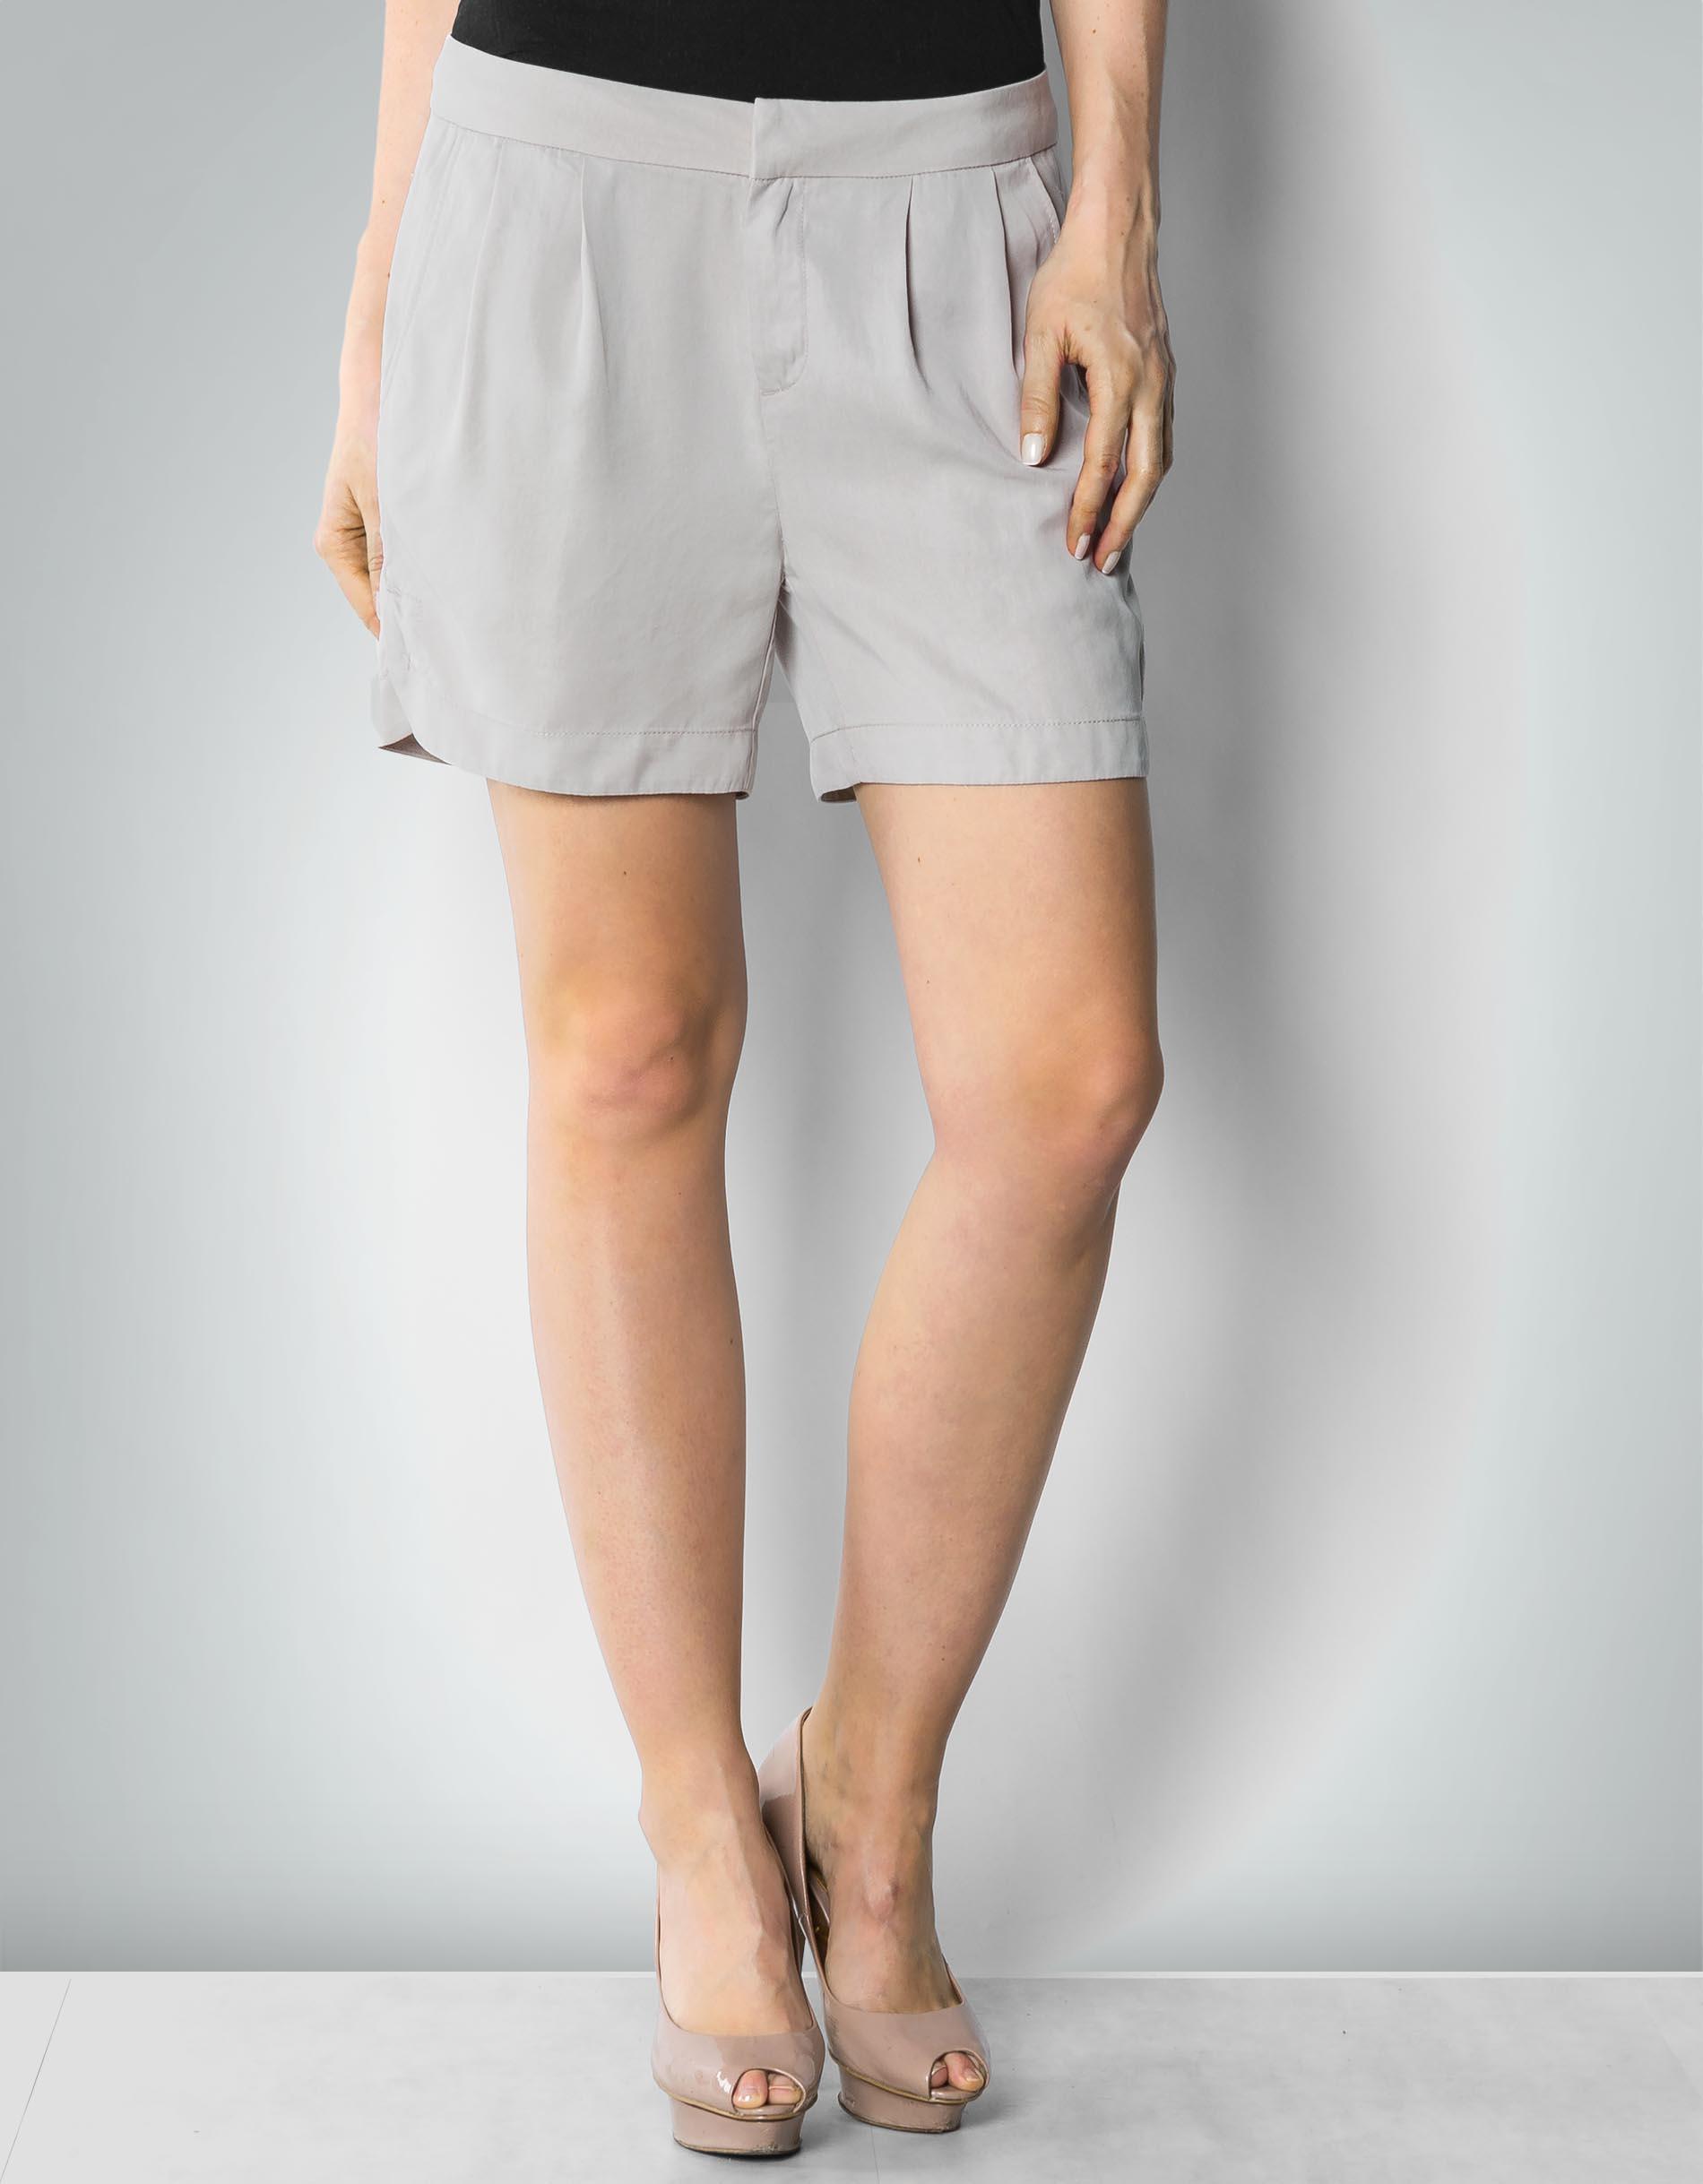 calvin klein jeans damen shorts short im chino style. Black Bedroom Furniture Sets. Home Design Ideas